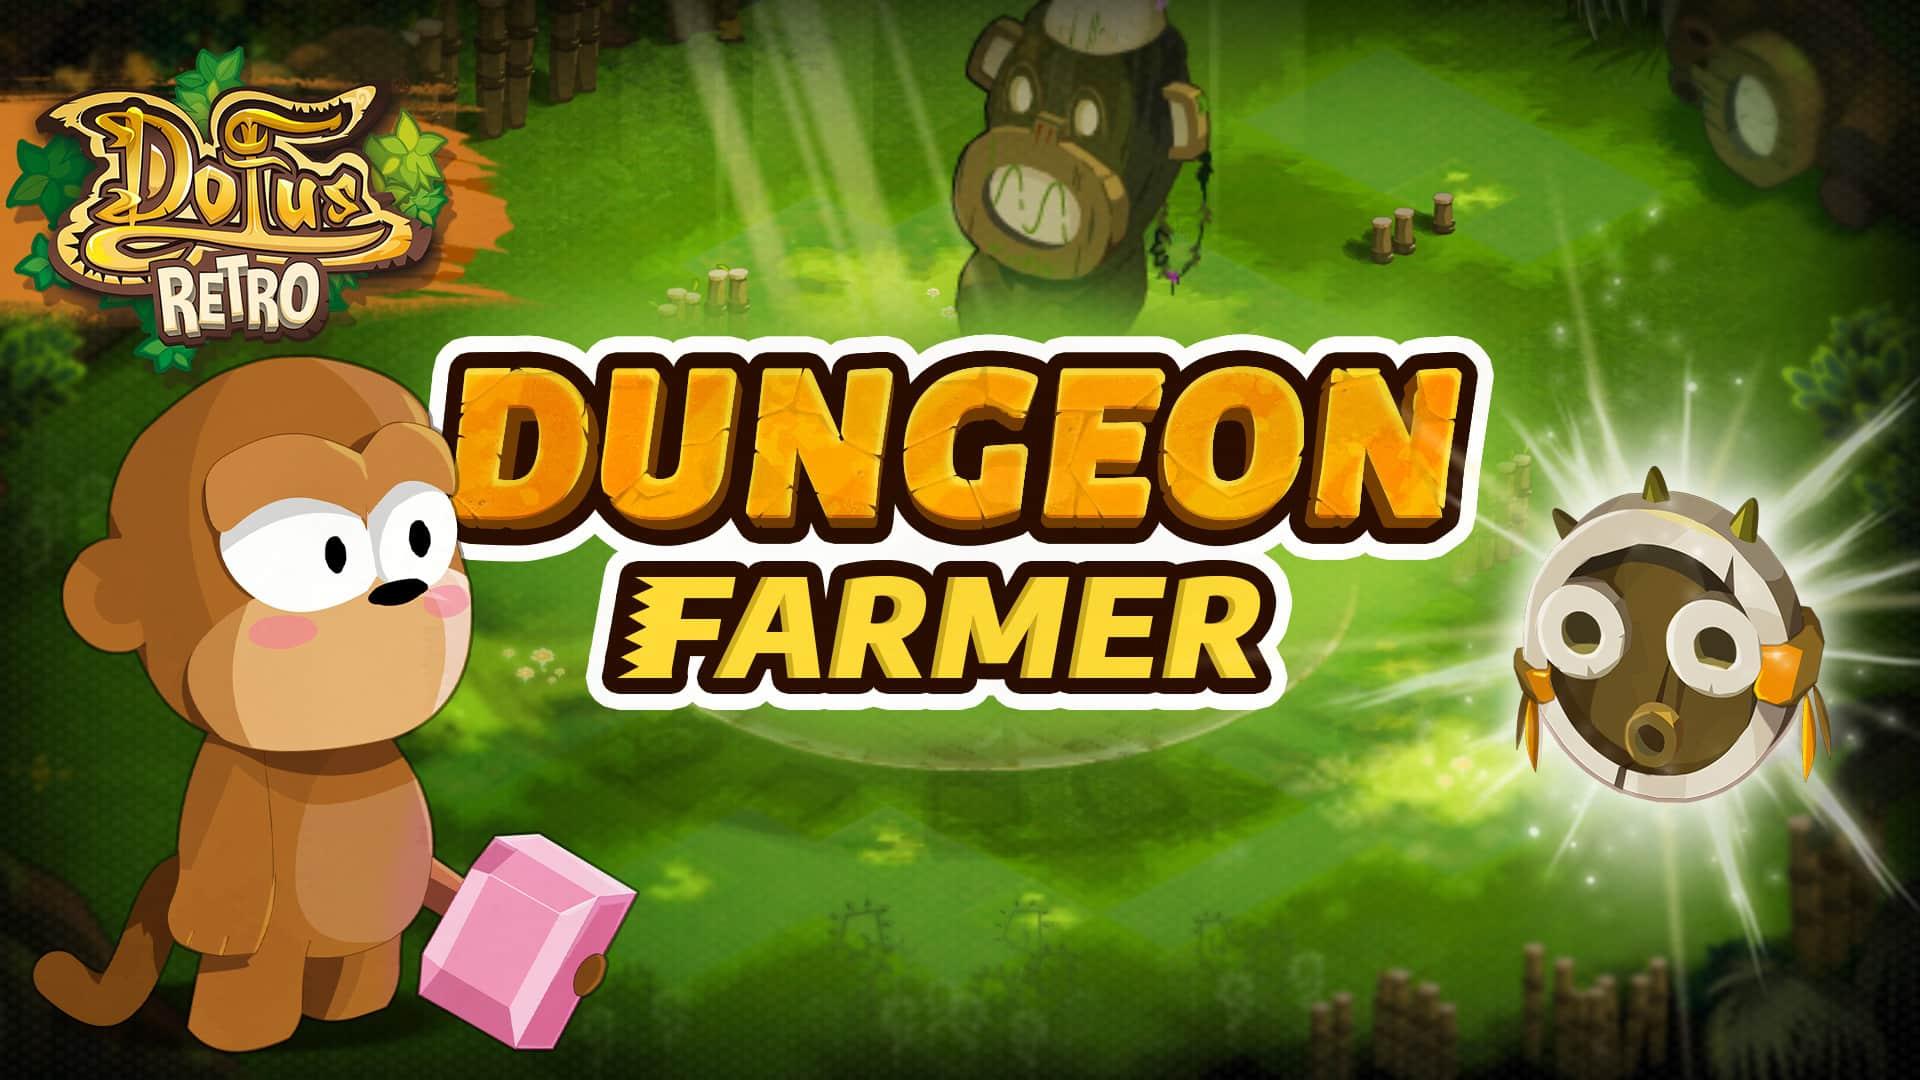 DOFUS Rétro : Dungeon Rusher-Farmer, Moon